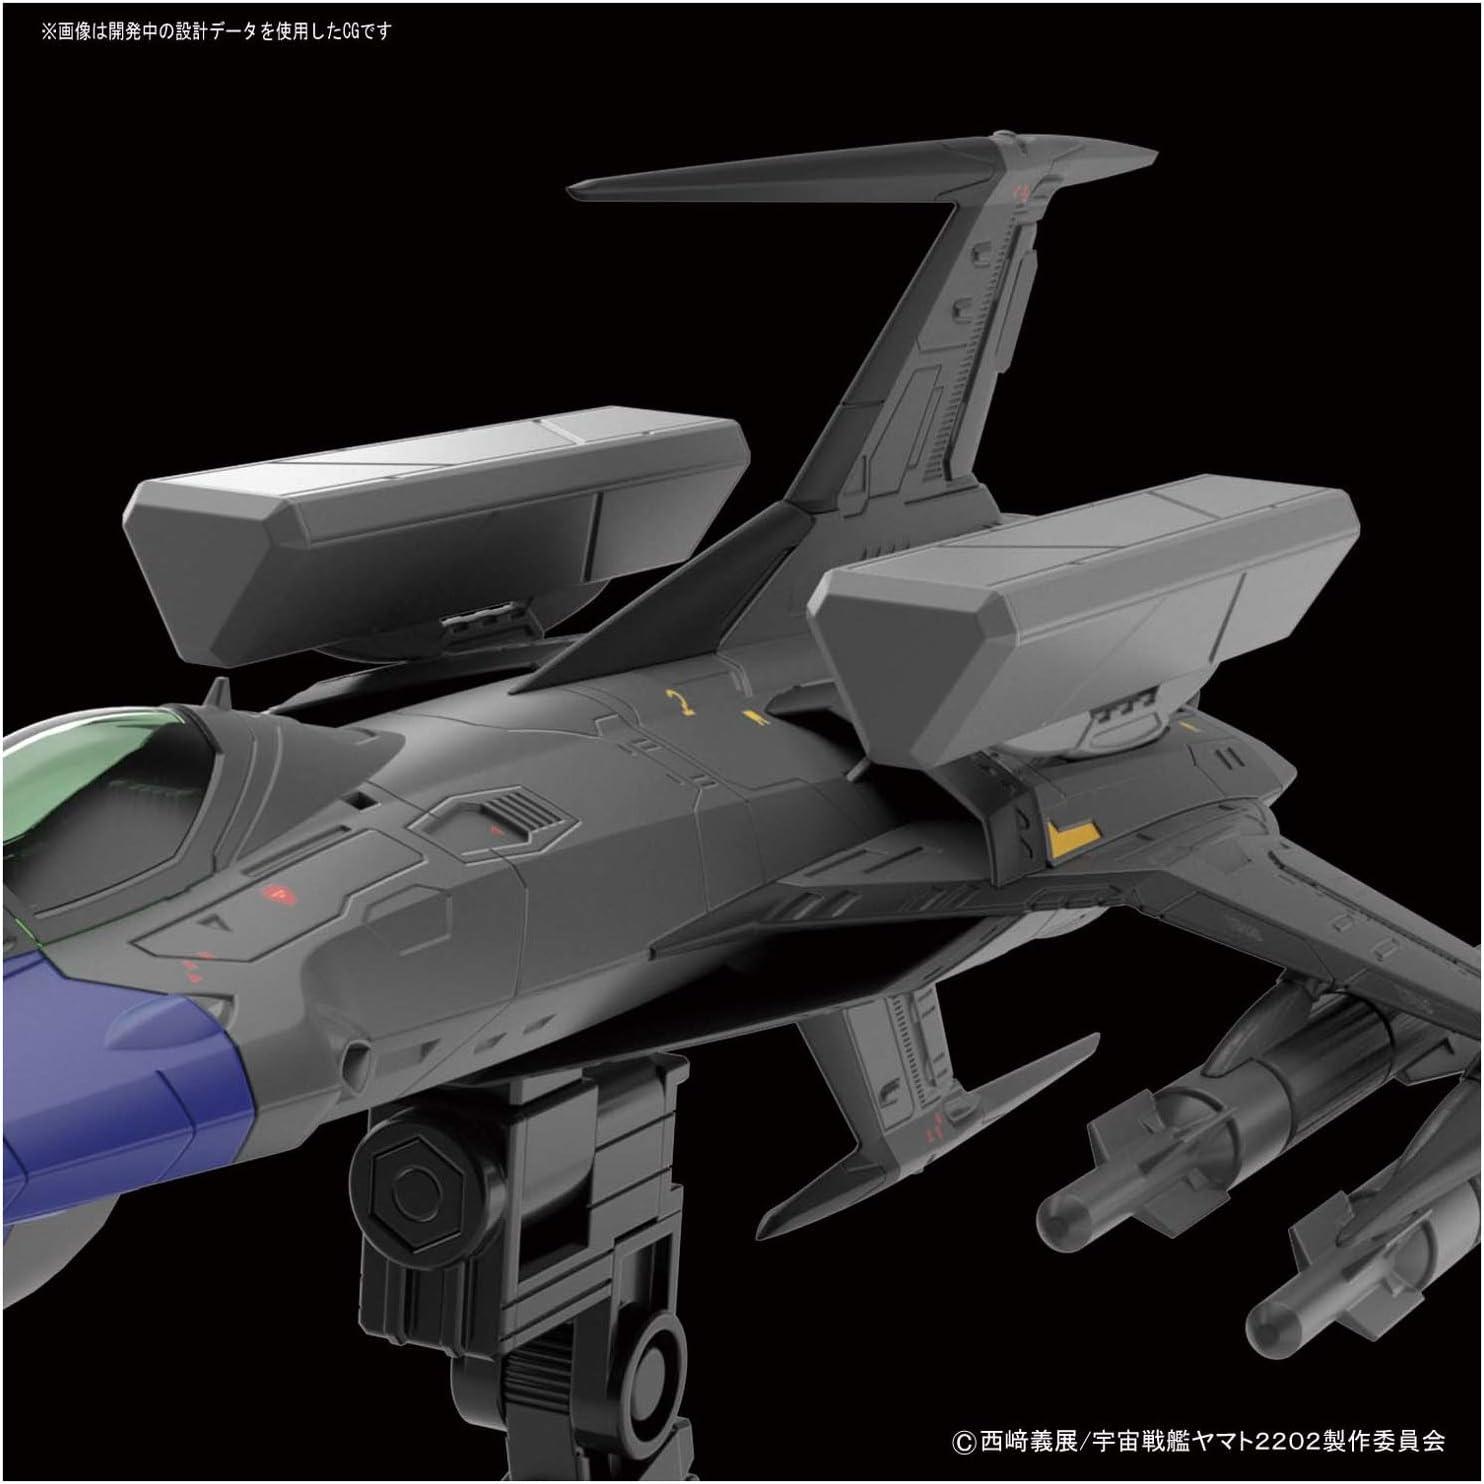 Bandai Hobby Starblazers Type 0 Model 52 Autonomous Space Fighter Black Bird Yam